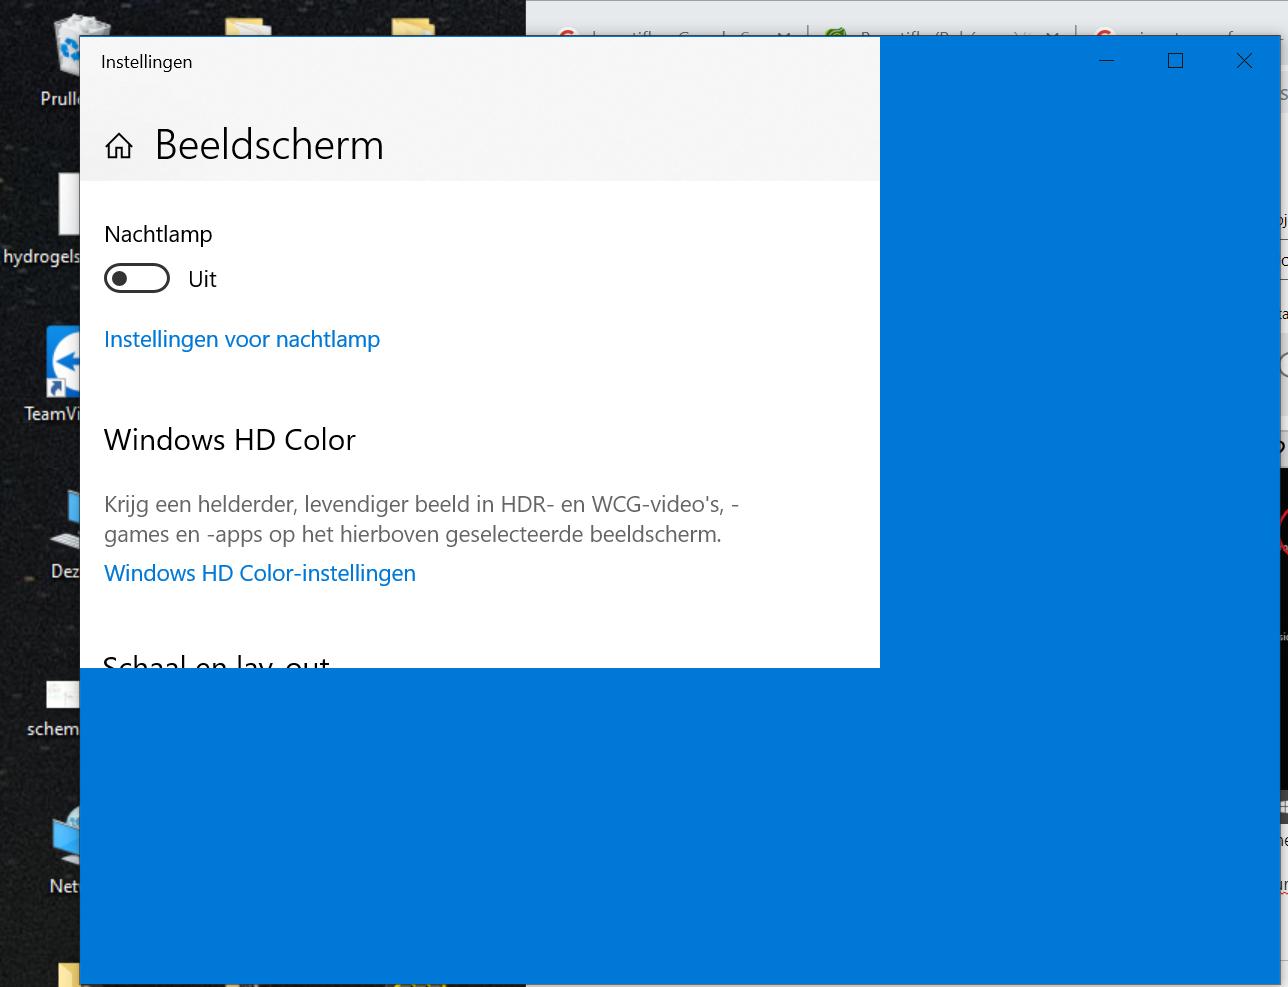 floating start menu after resolution change 02d721b9-825f-42bd-bf0e-db666f0bf40b?upload=true.png